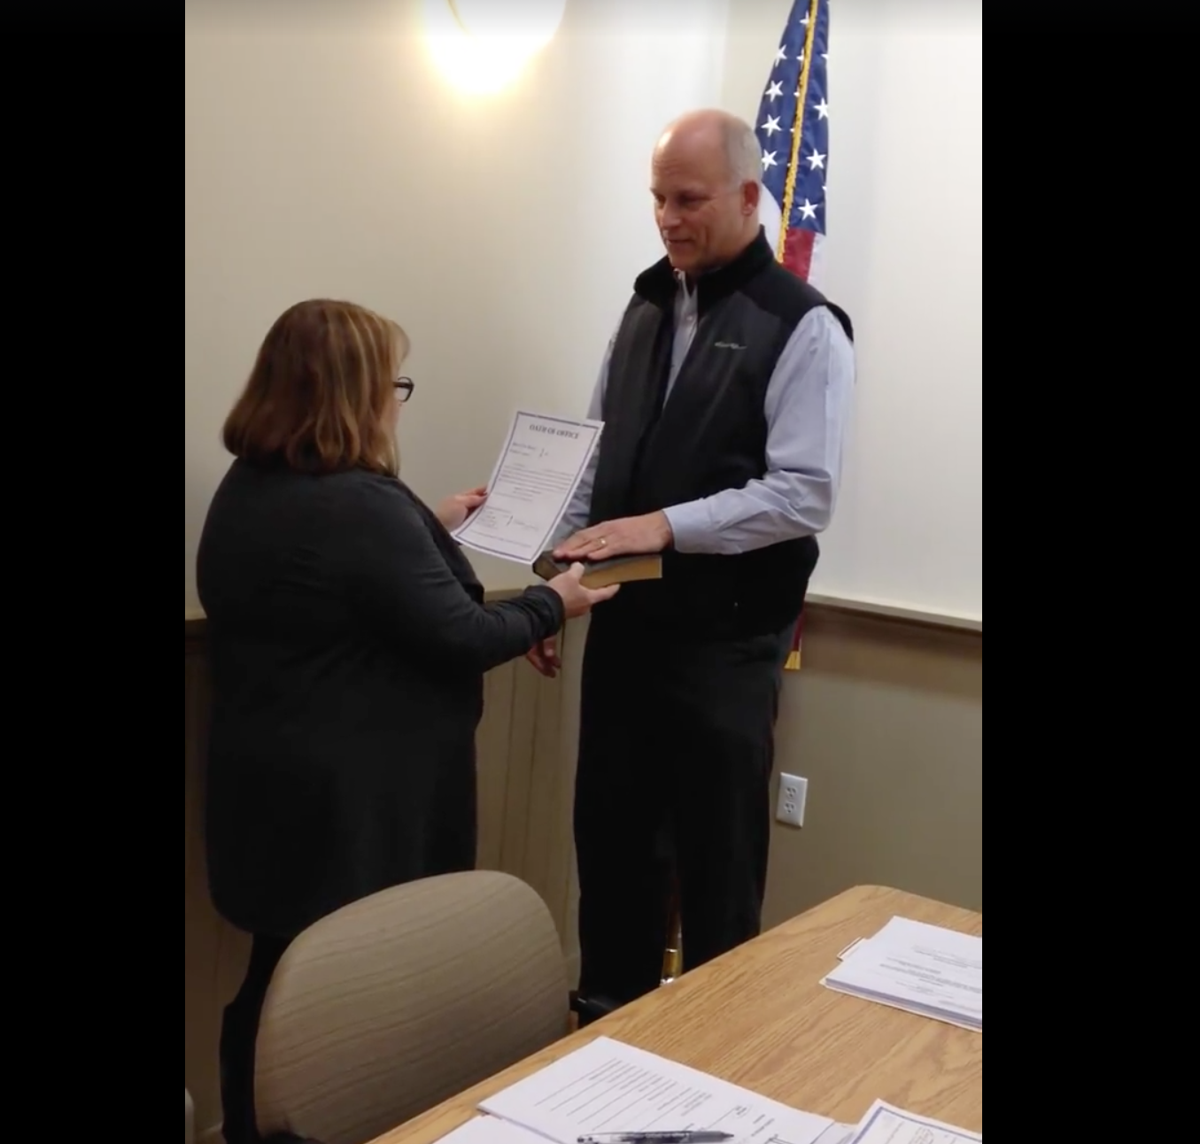 Califon has two new councilmen, discusses upcoming centennial celebration